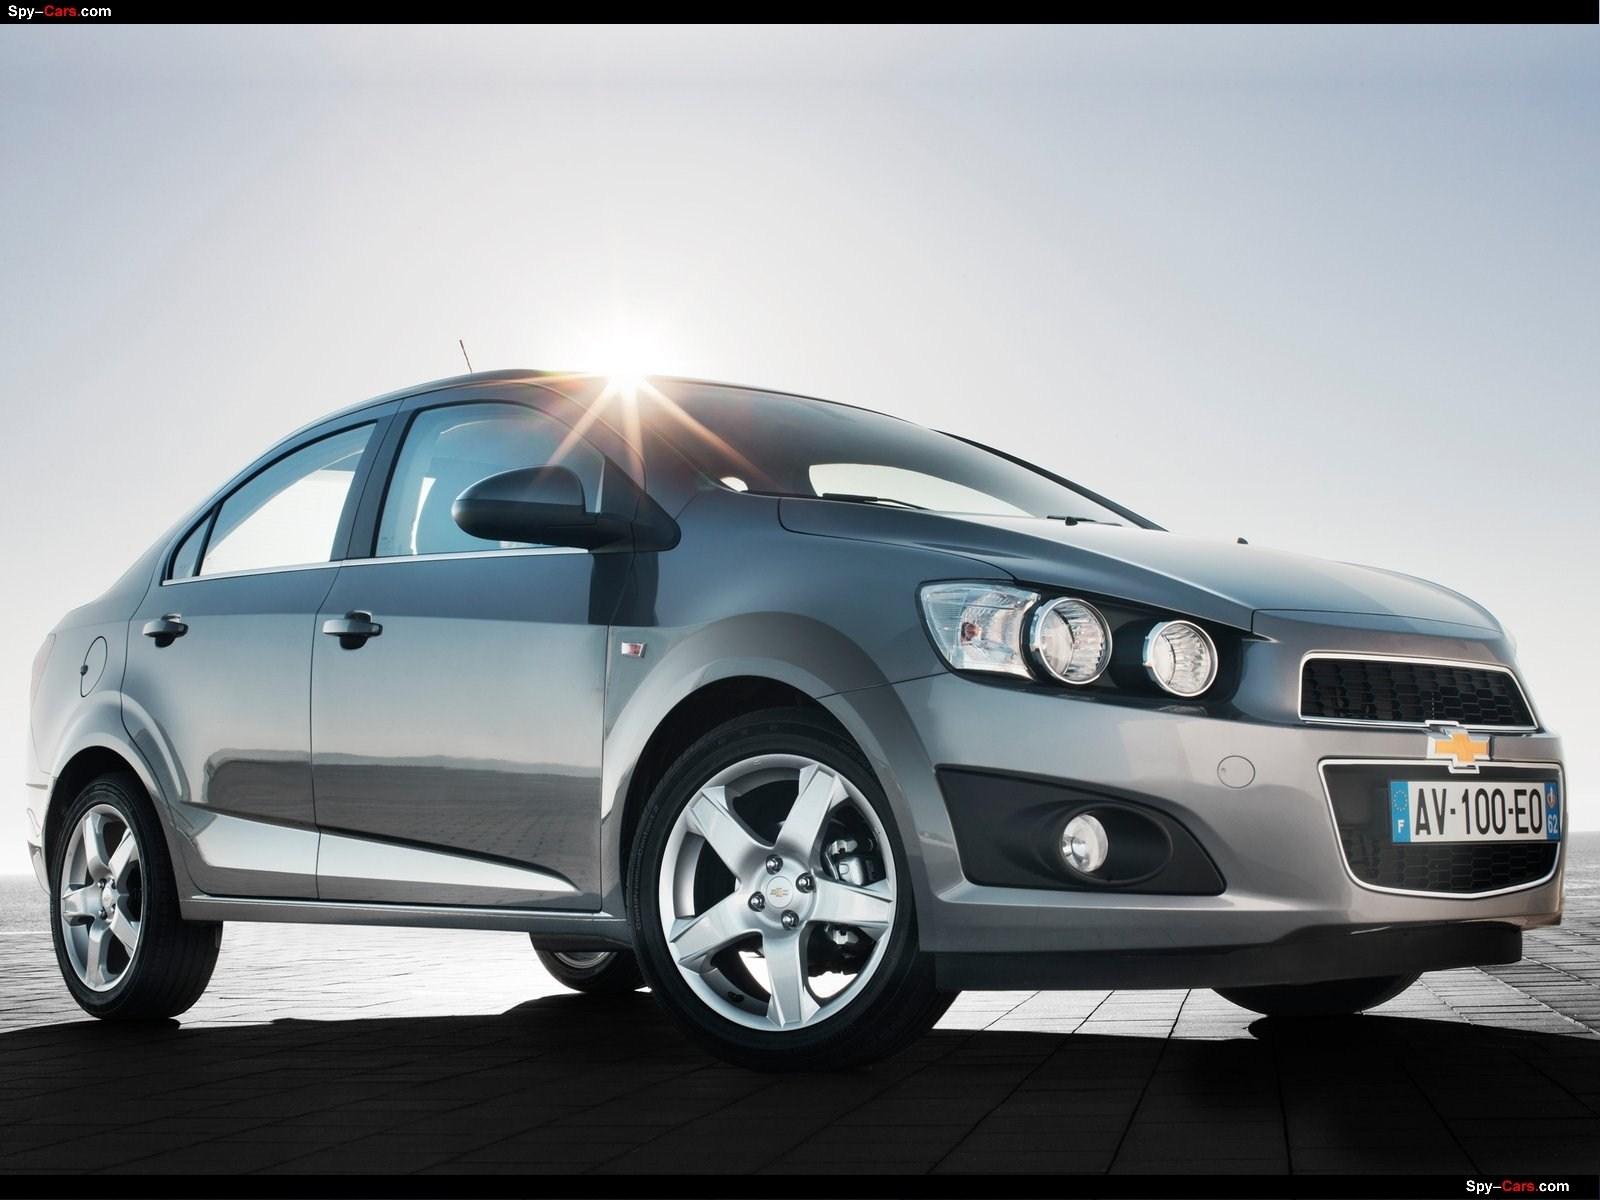 2012 Chevrolet Aveo Sedan Chevrolet Autos Spain